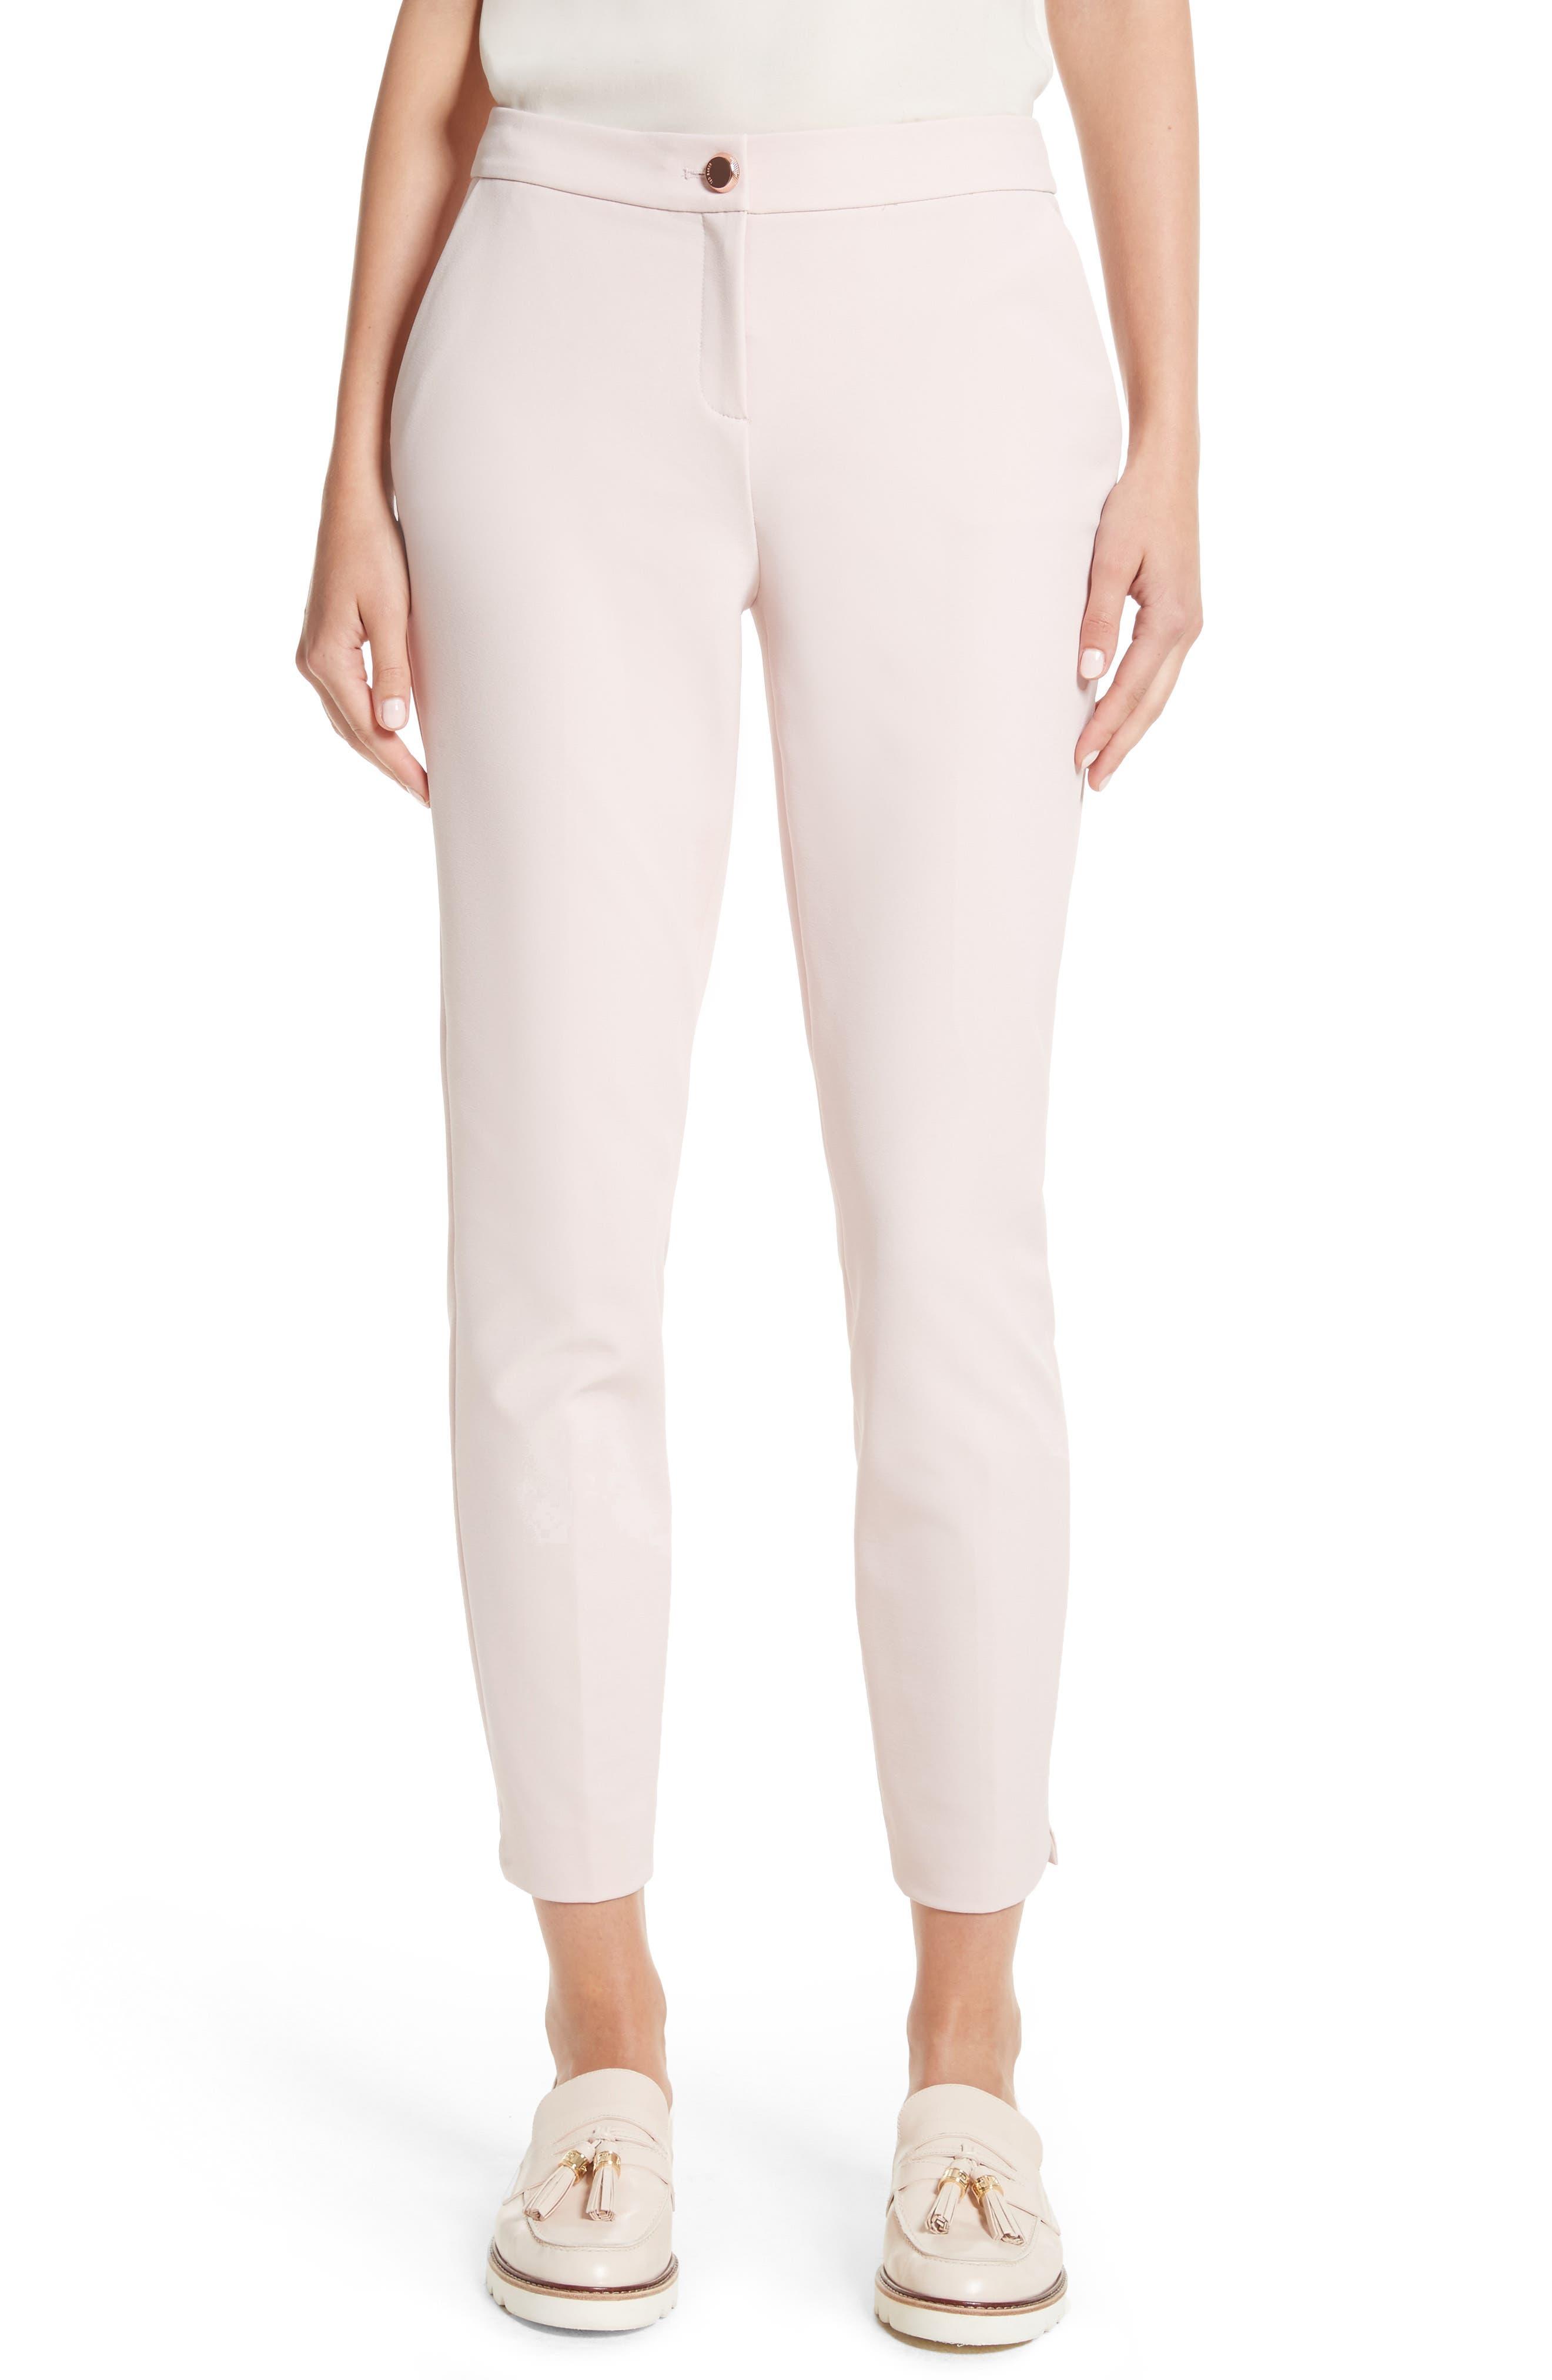 Suria Tailored Ankle Grazer Trousers,                         Main,                         color, 680